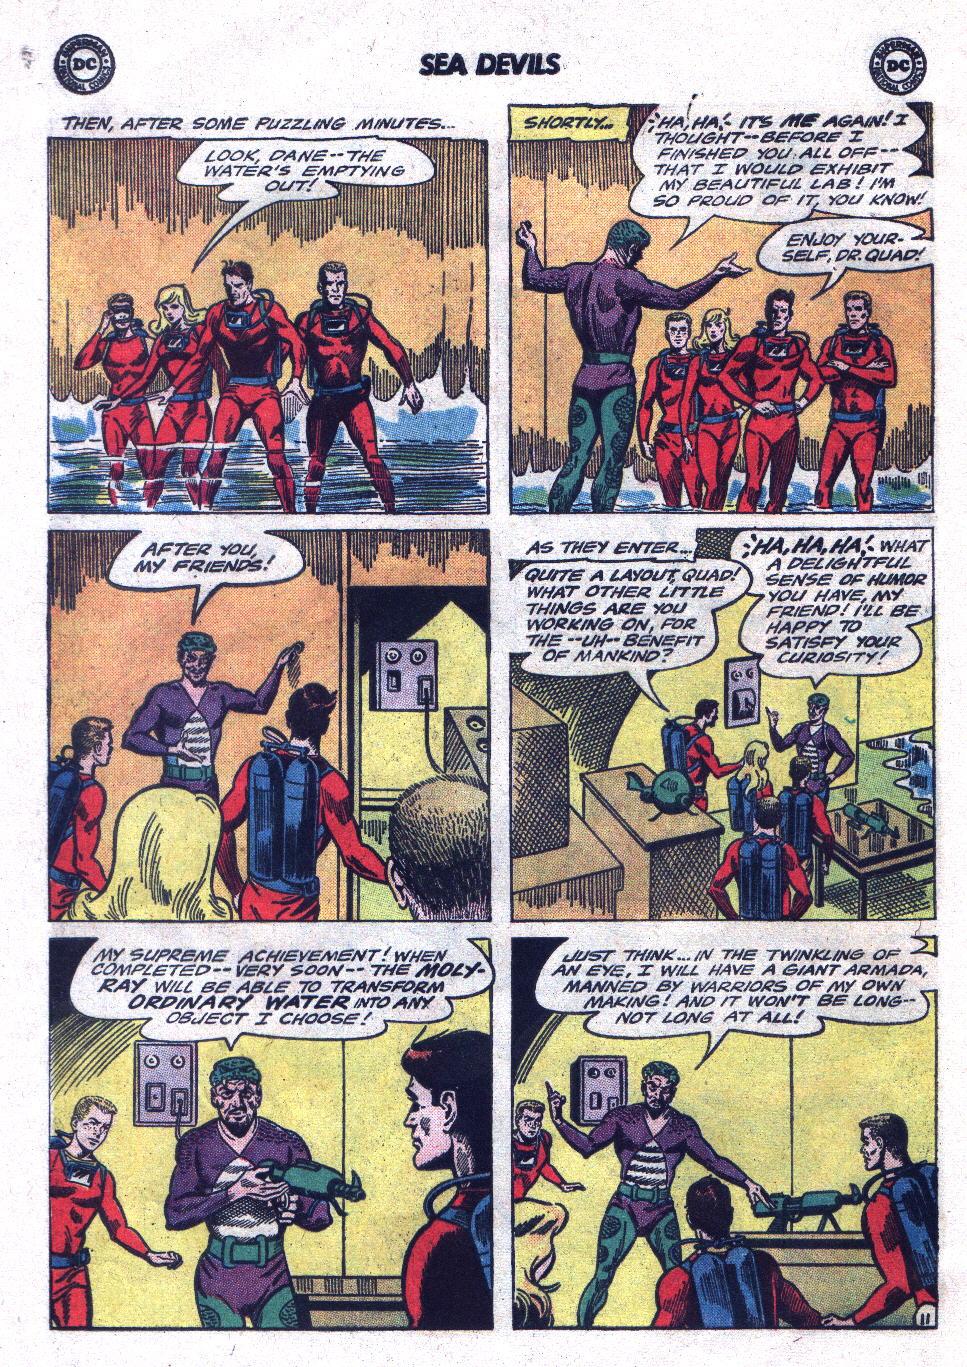 Read online Sea Devils comic -  Issue #21 - 16